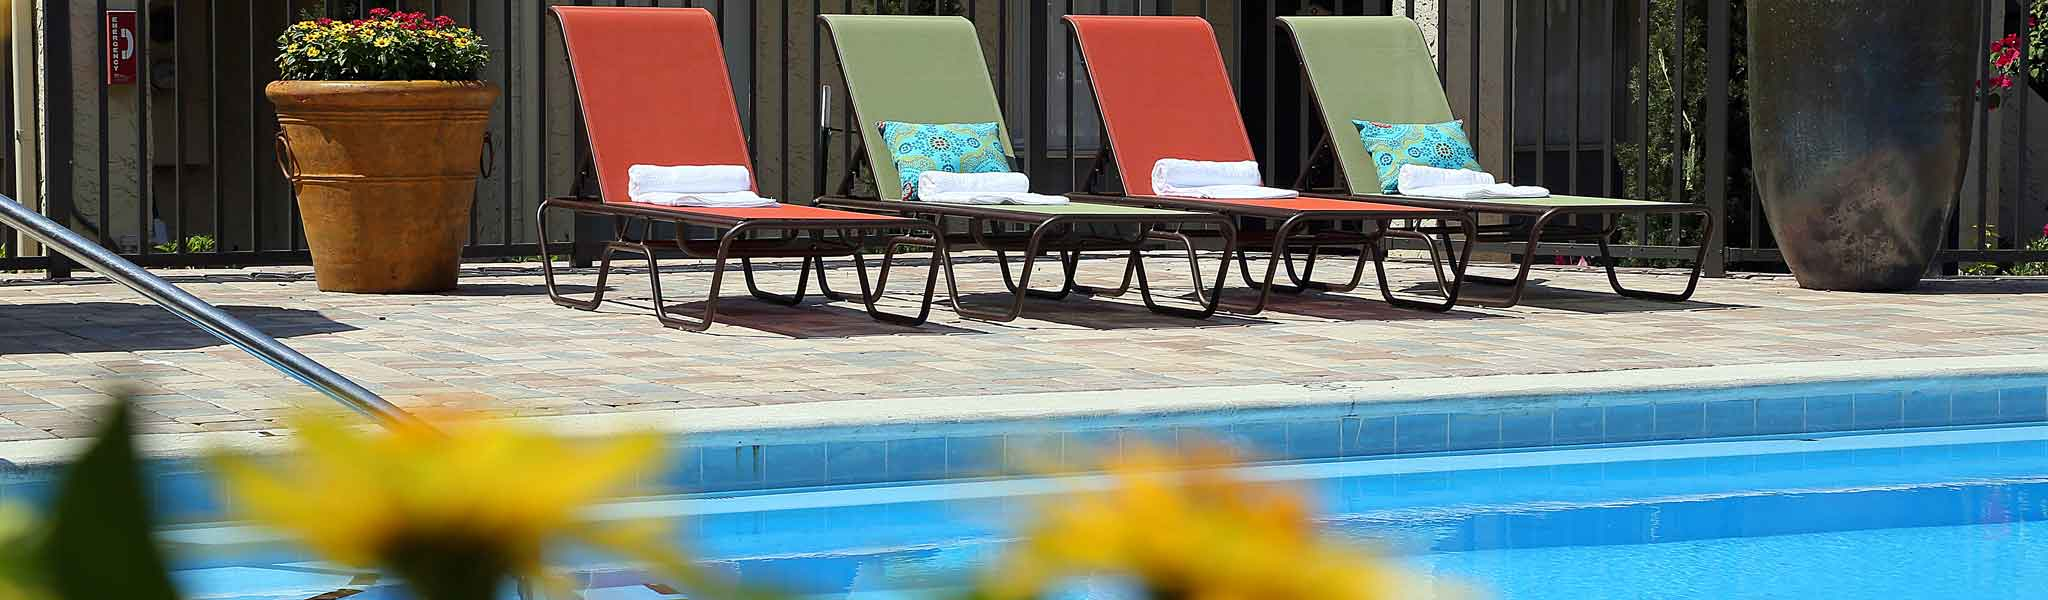 Norcross Ga Apartments For Rent Aspen Square Management